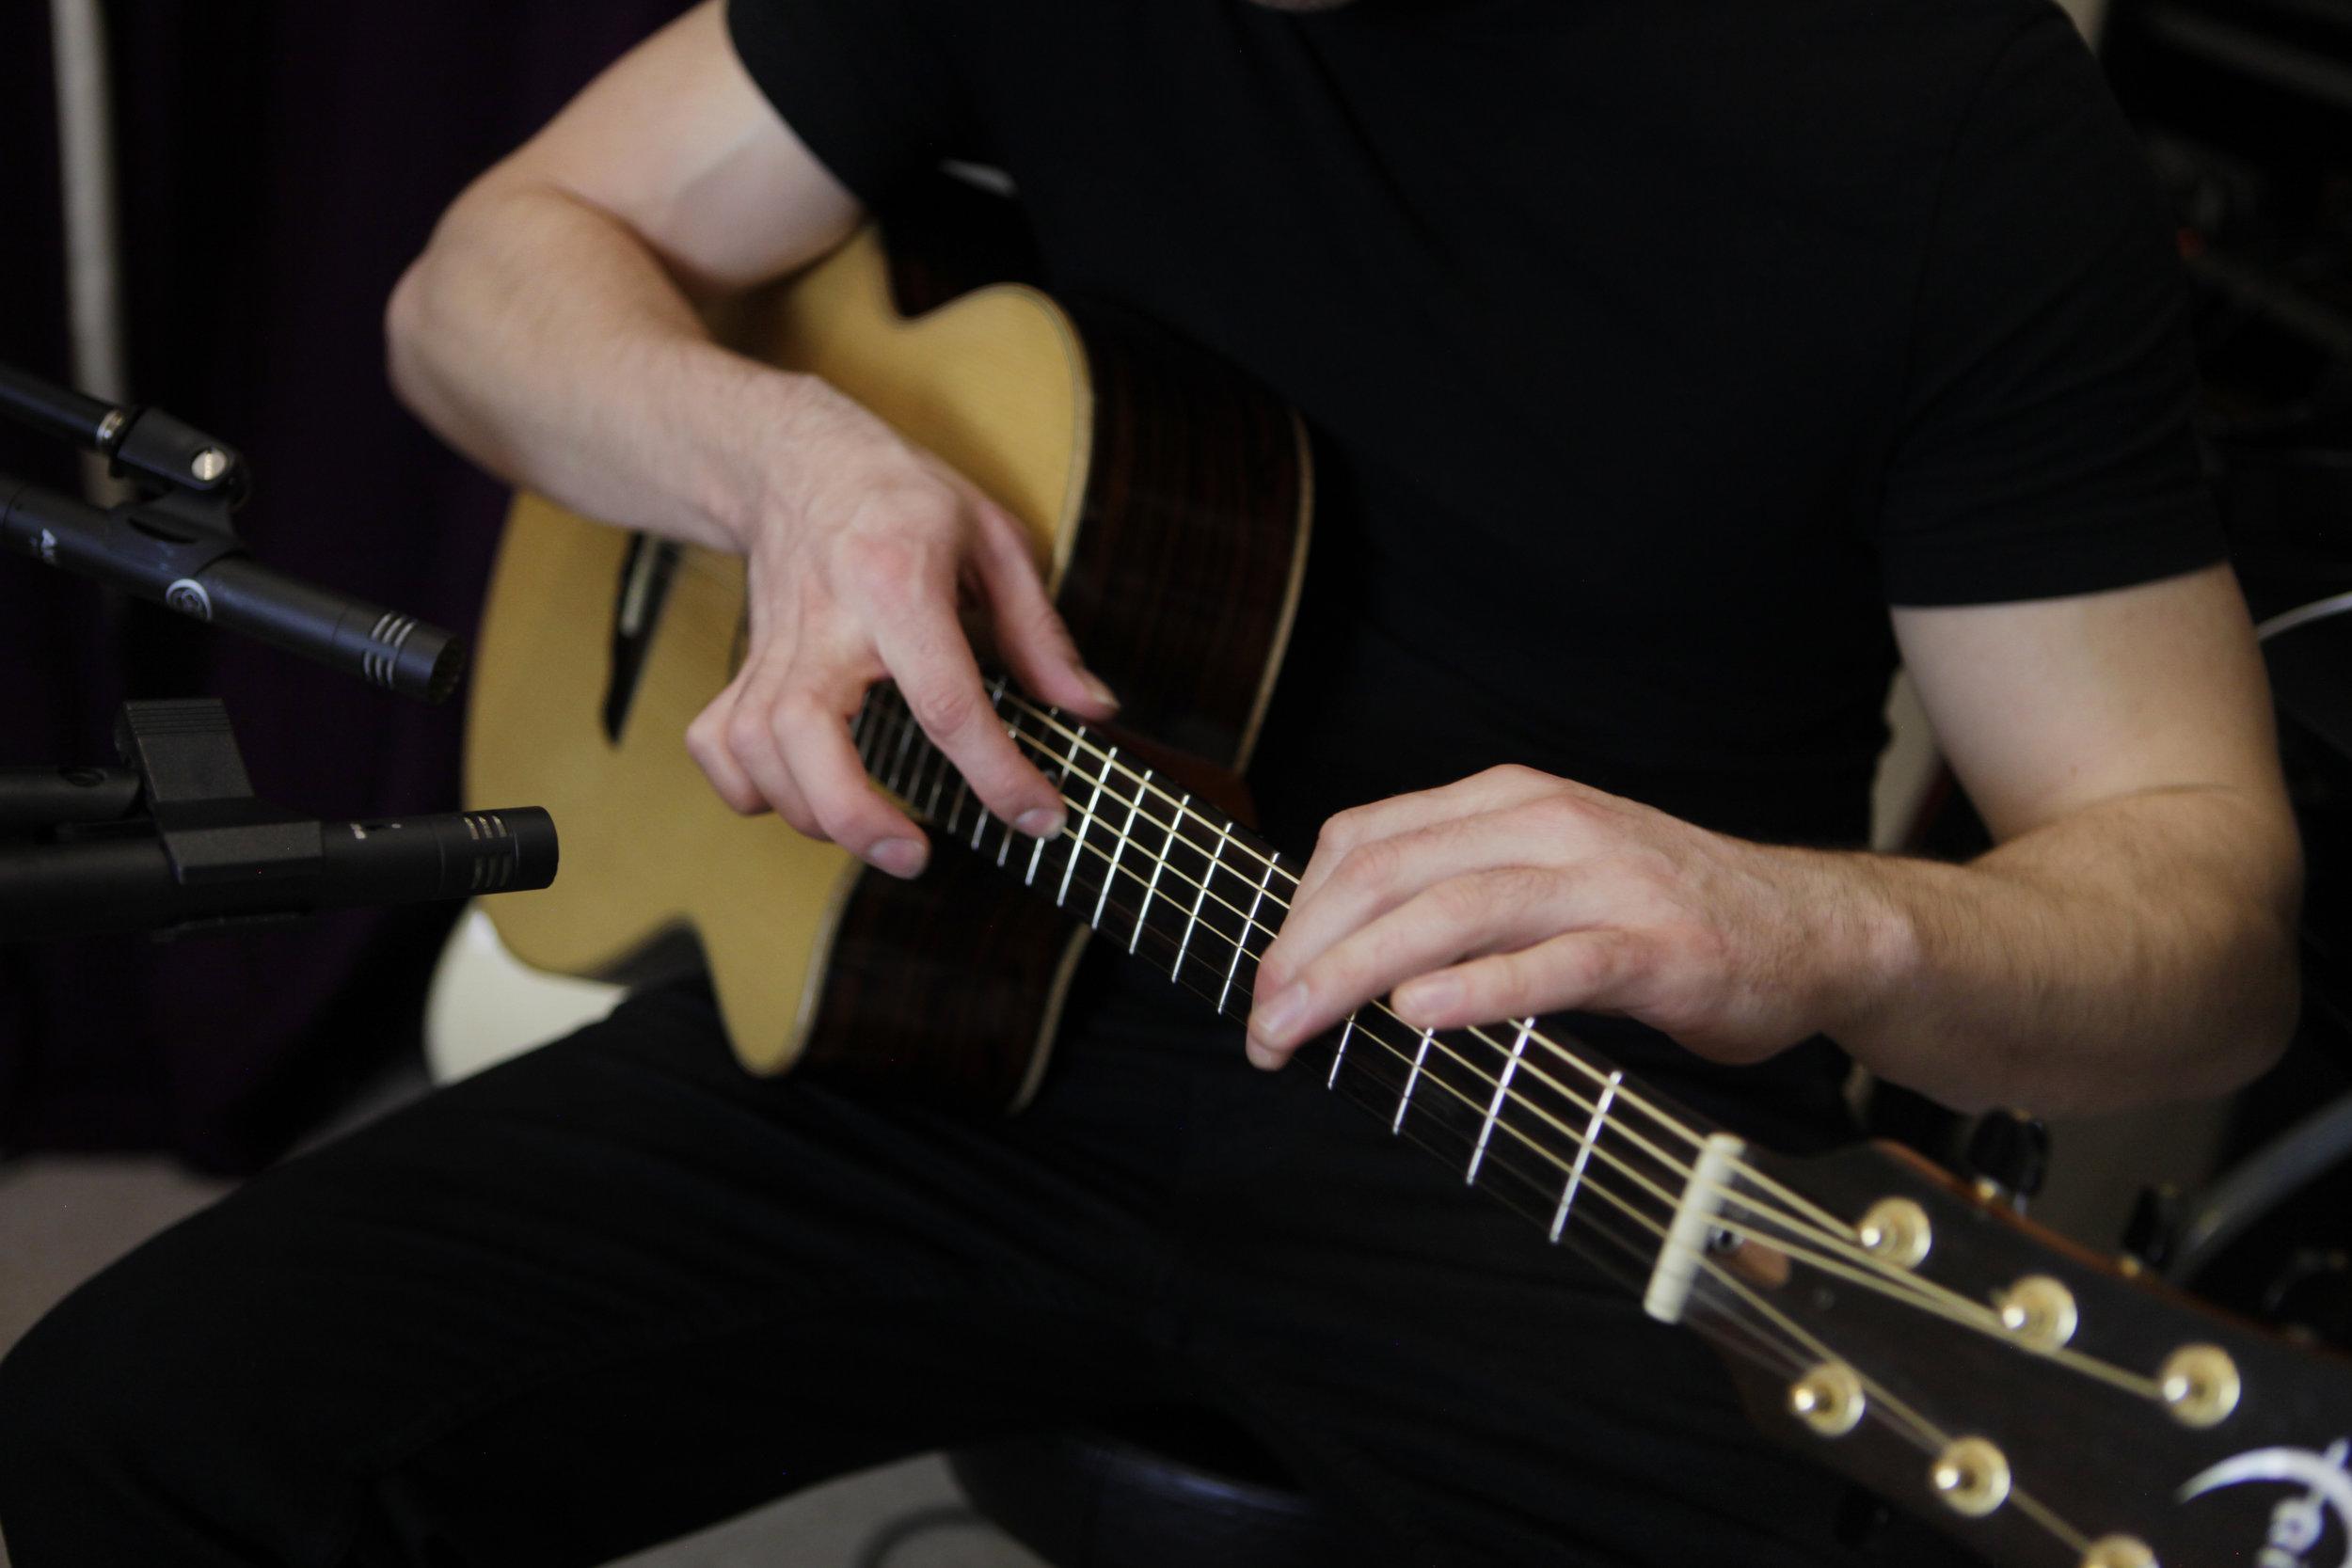 Patrick recording at his Canary Wharf studio